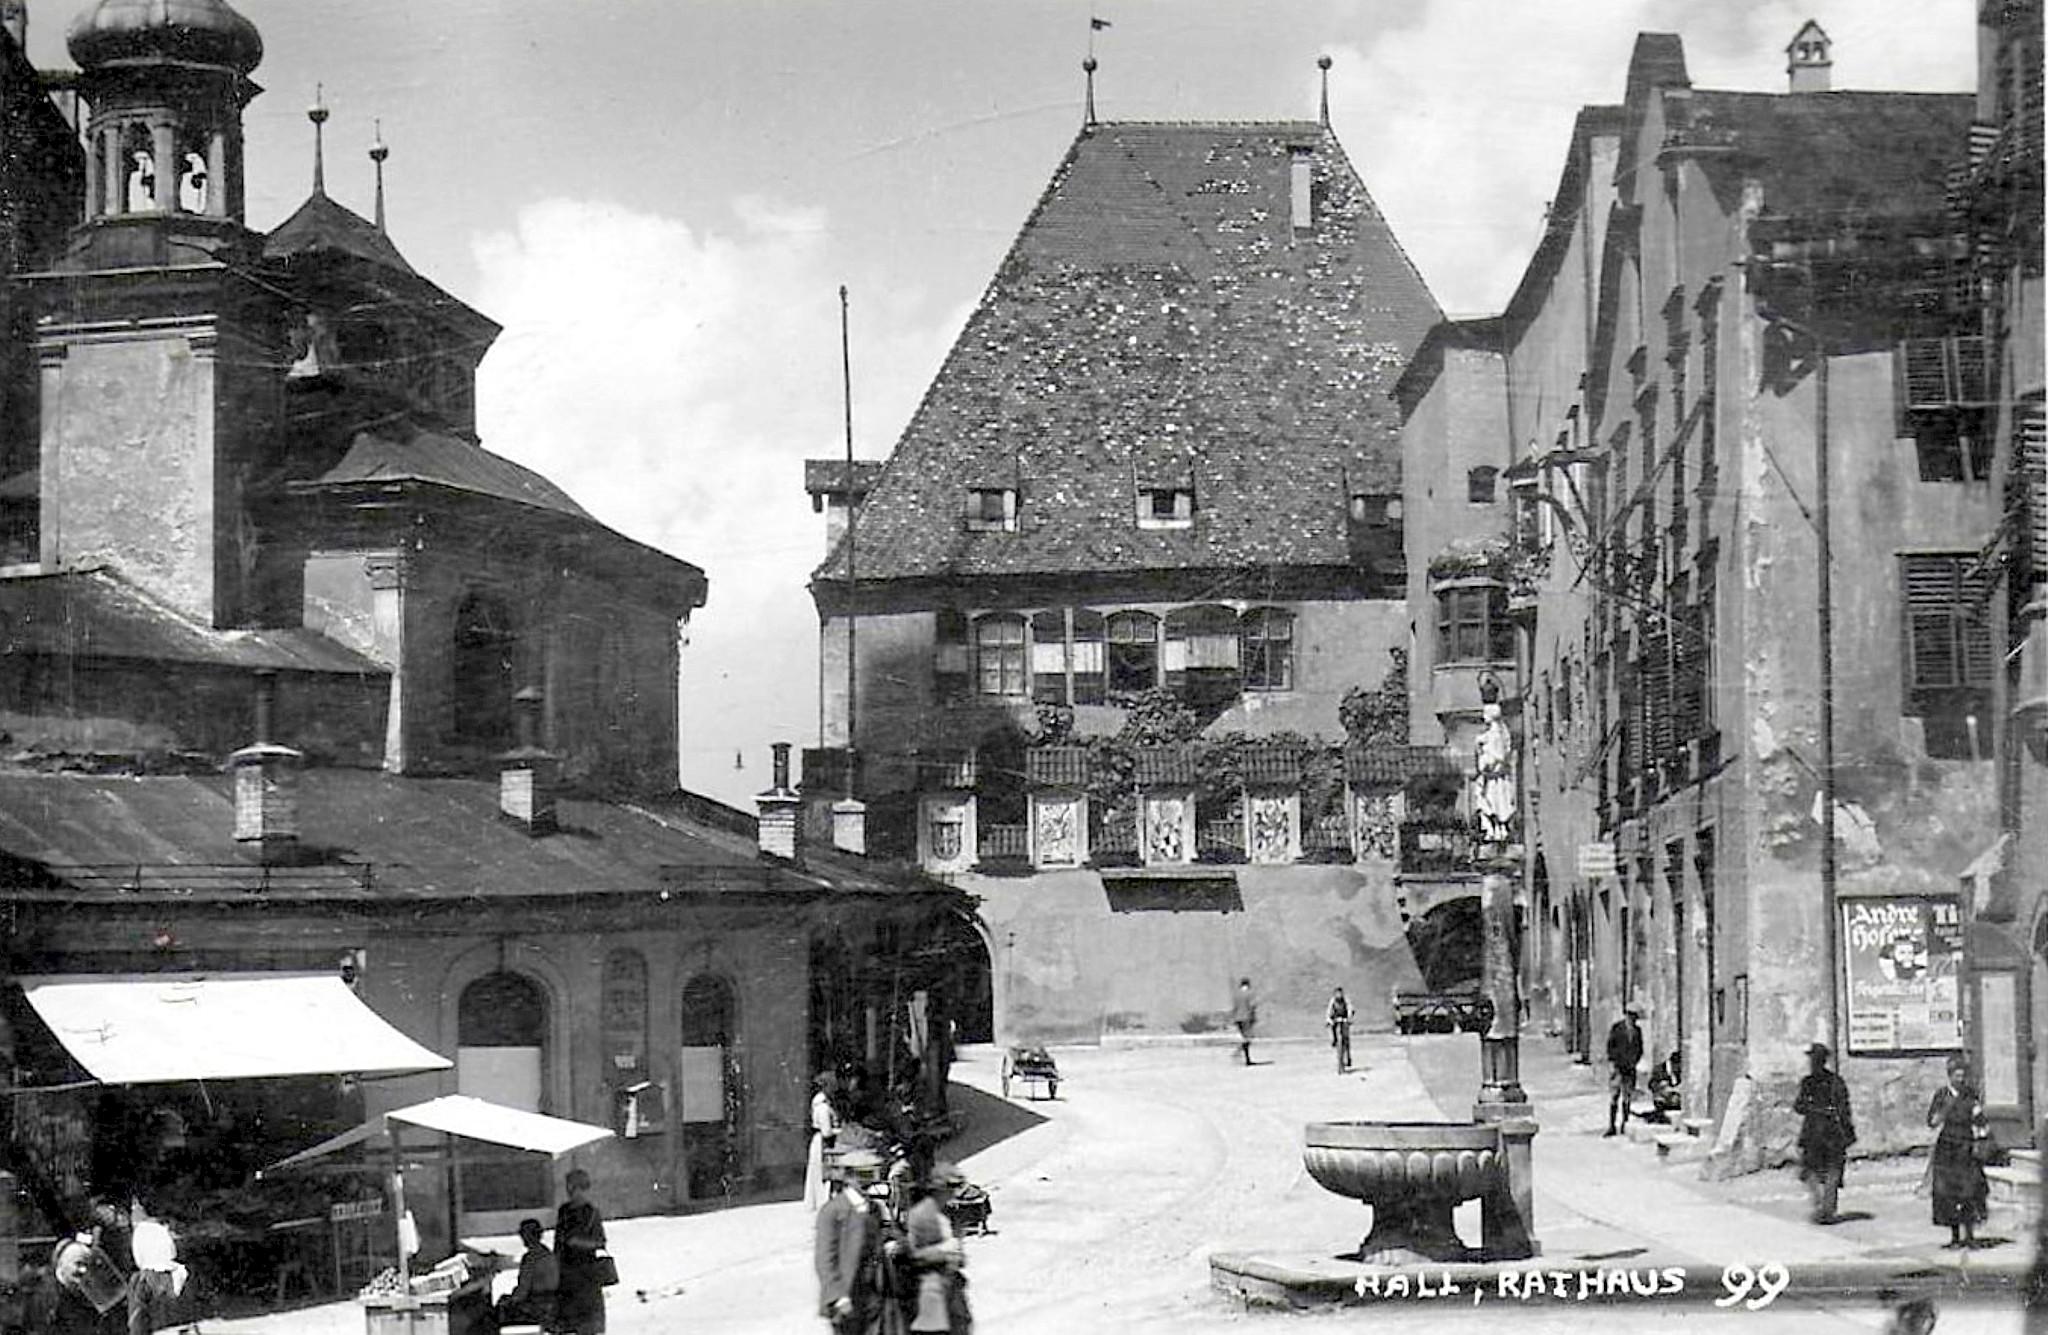 Hall 1925, Rathaus